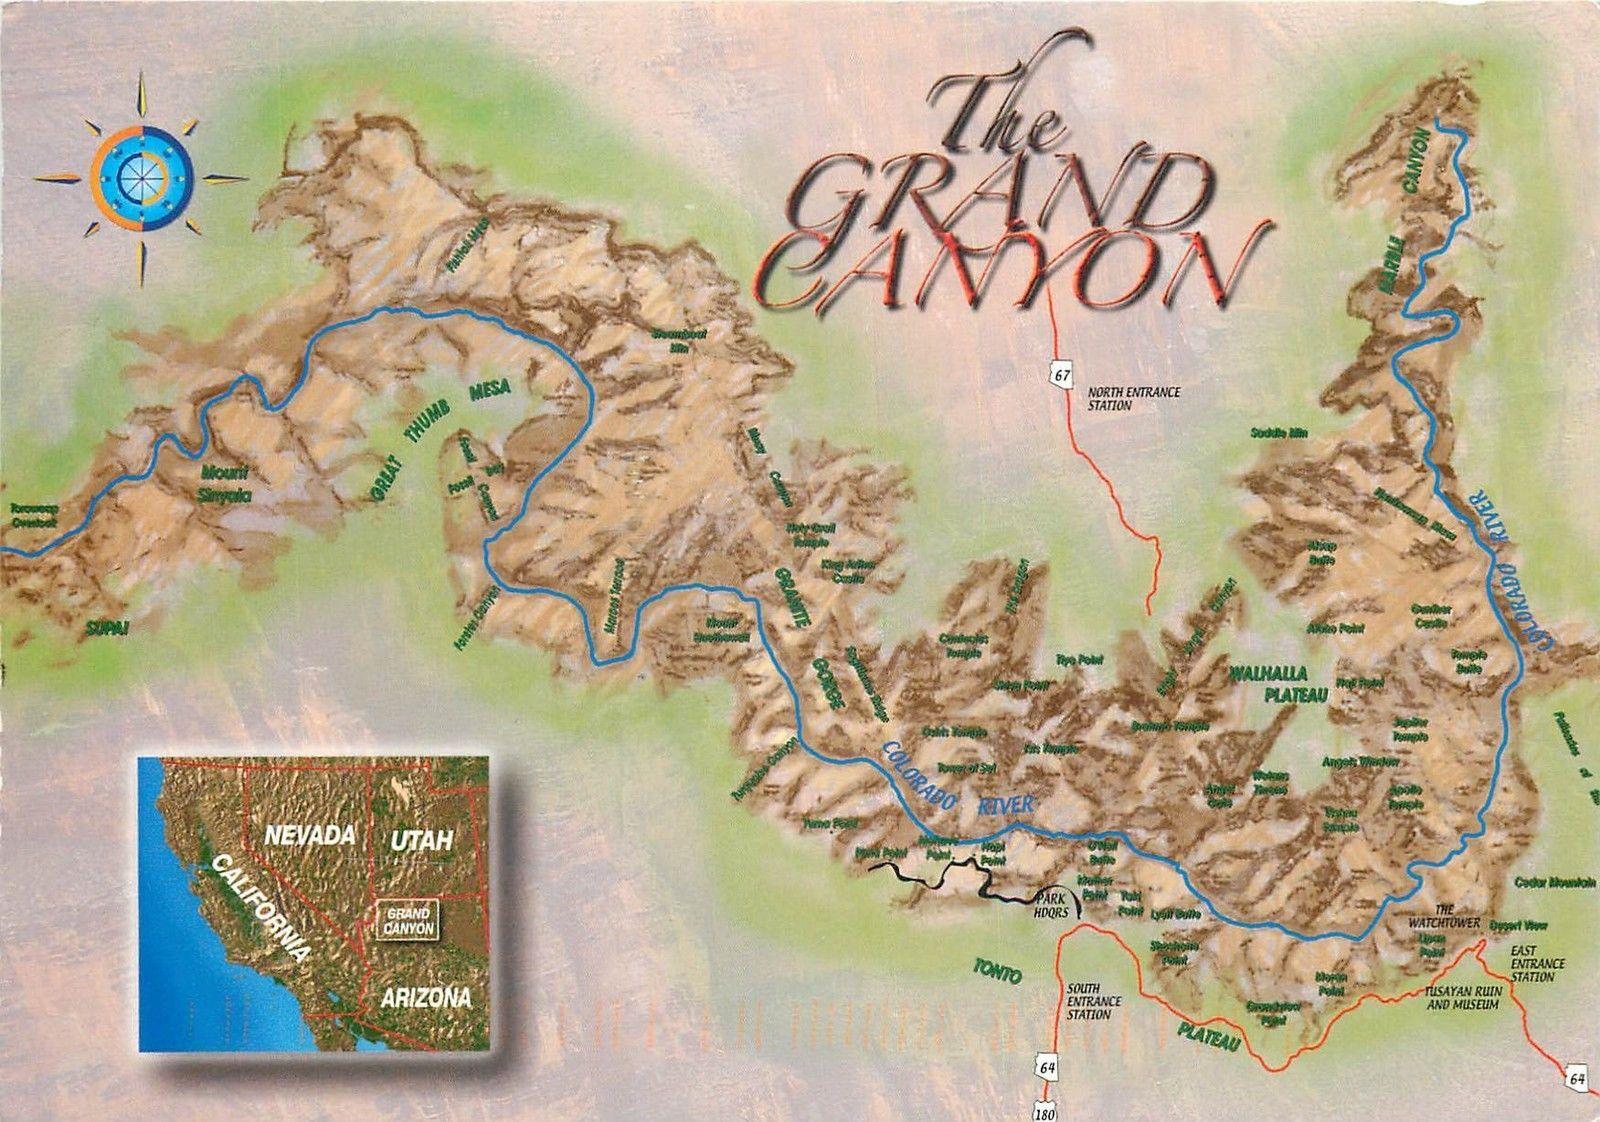 Map Of Colorado River In Arizona.The Grand Canyon Colorado River Map Postcard United States Arizona